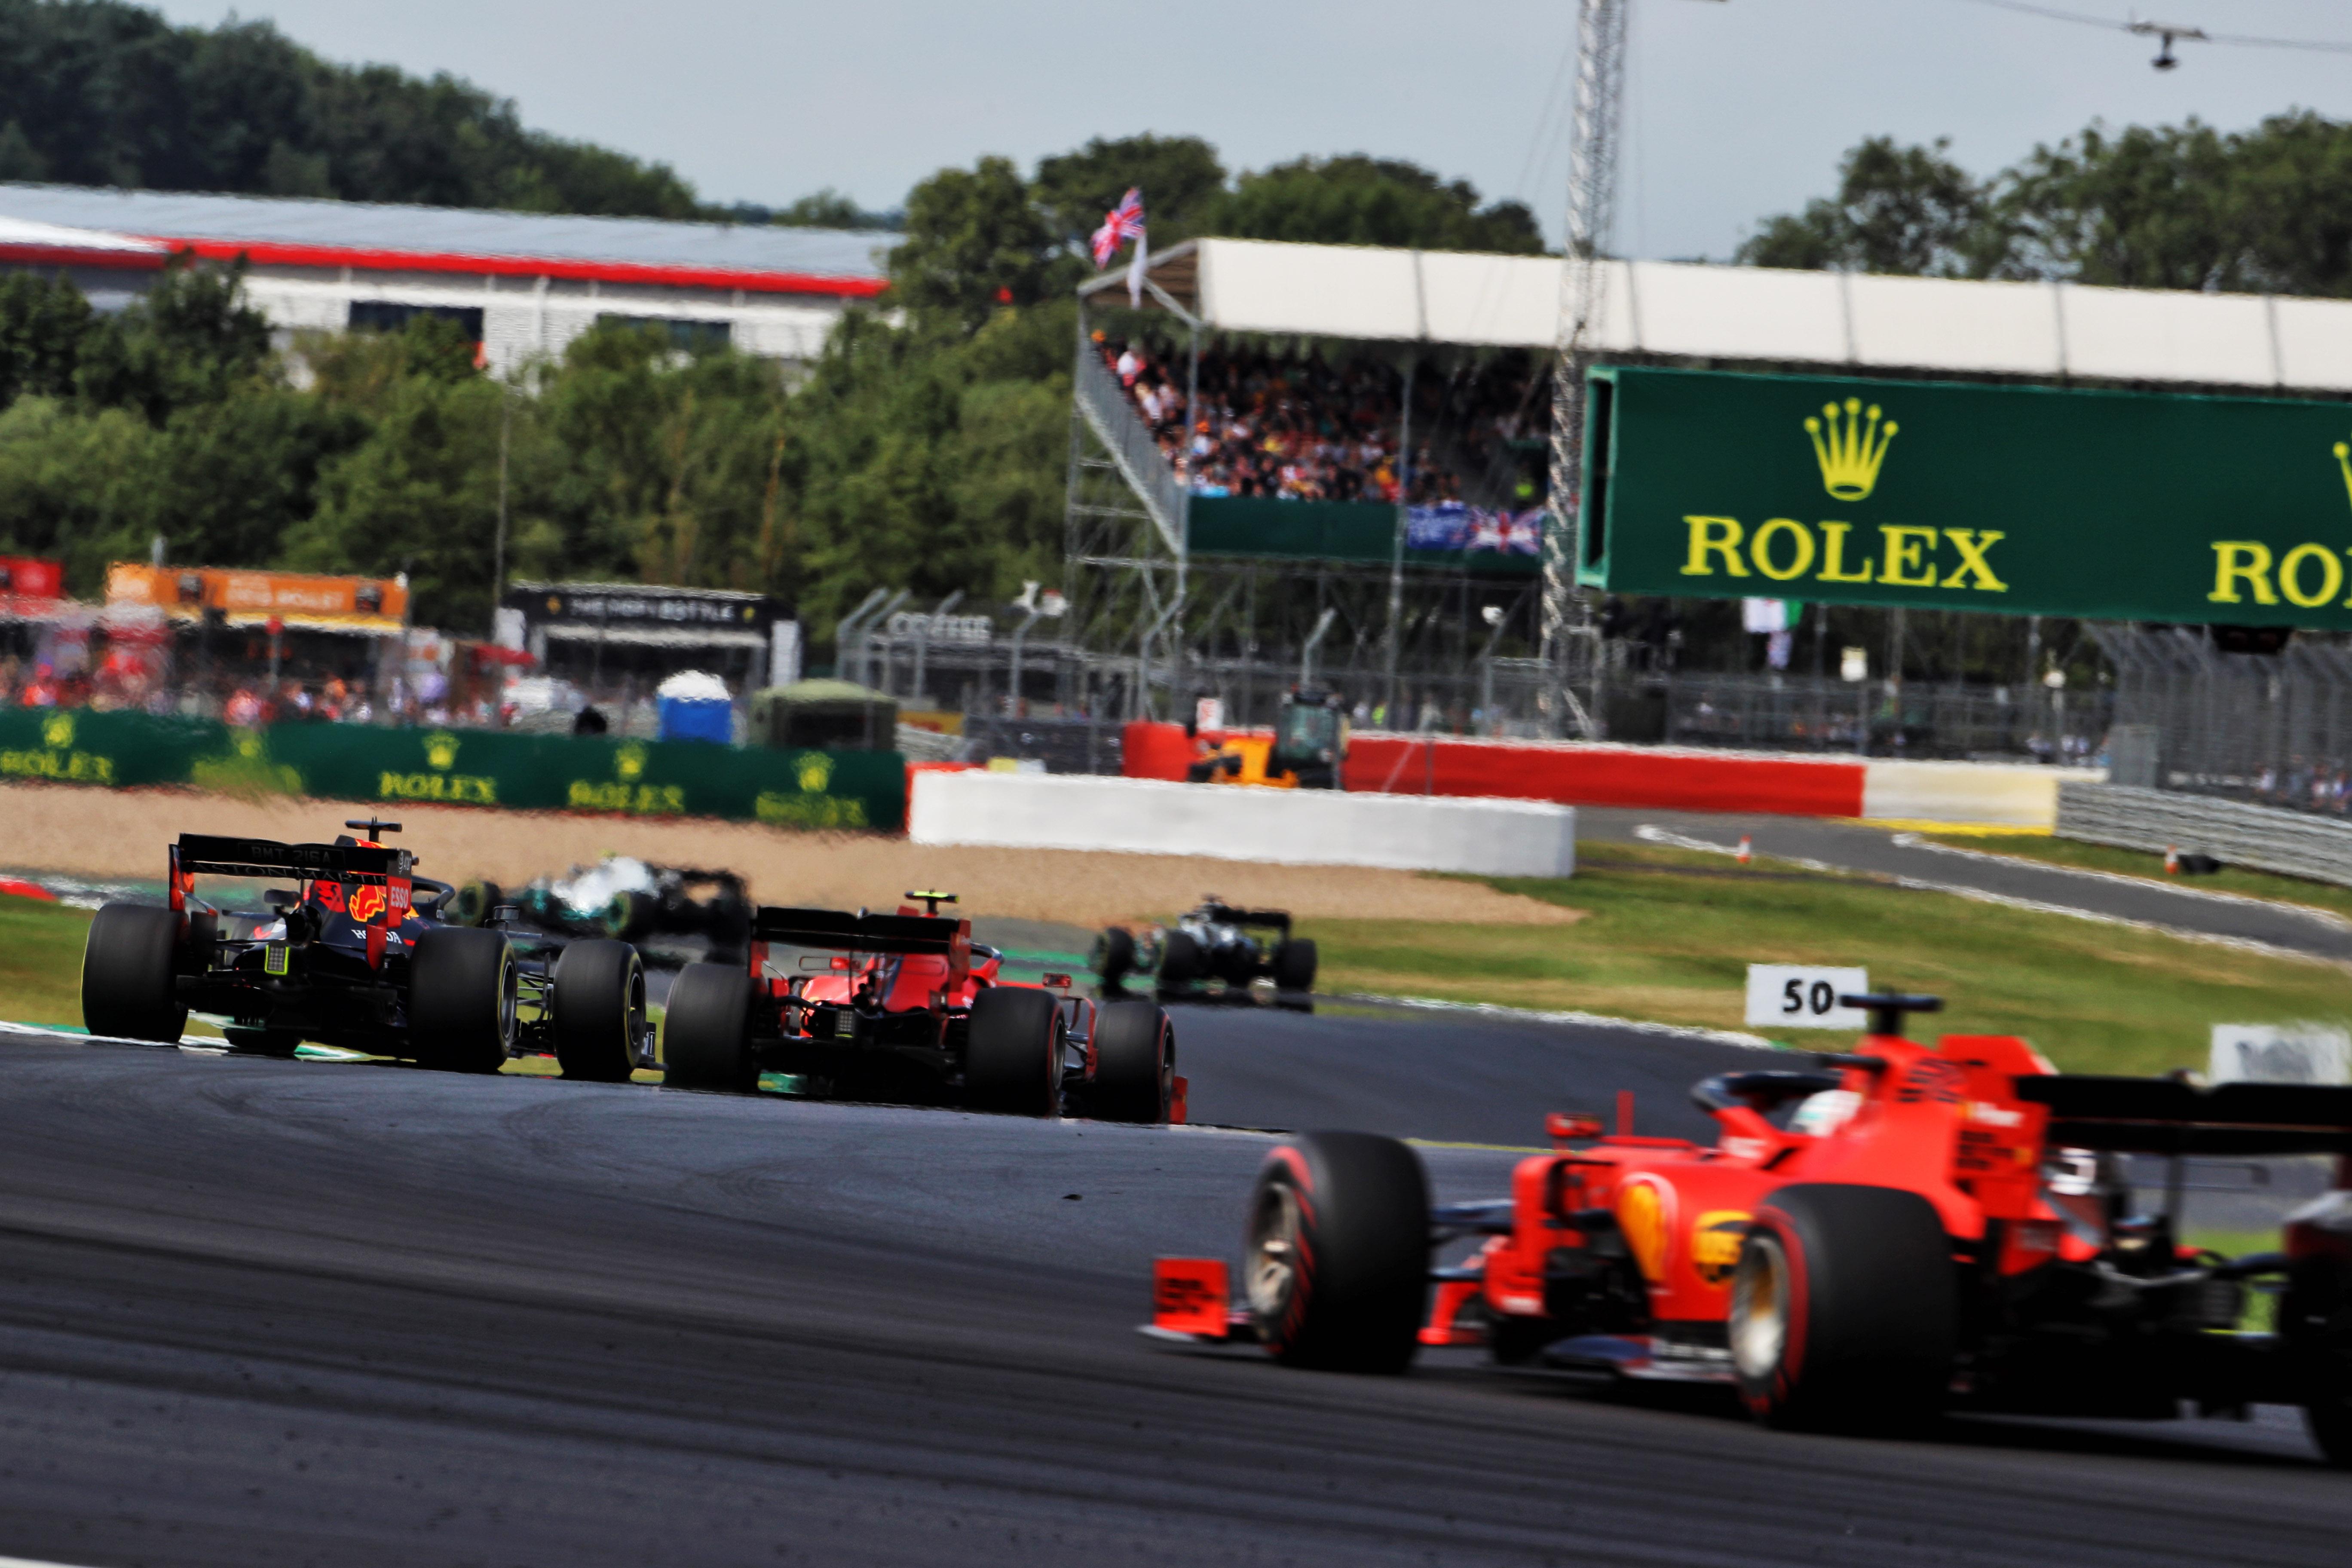 Silverstone F1 2020